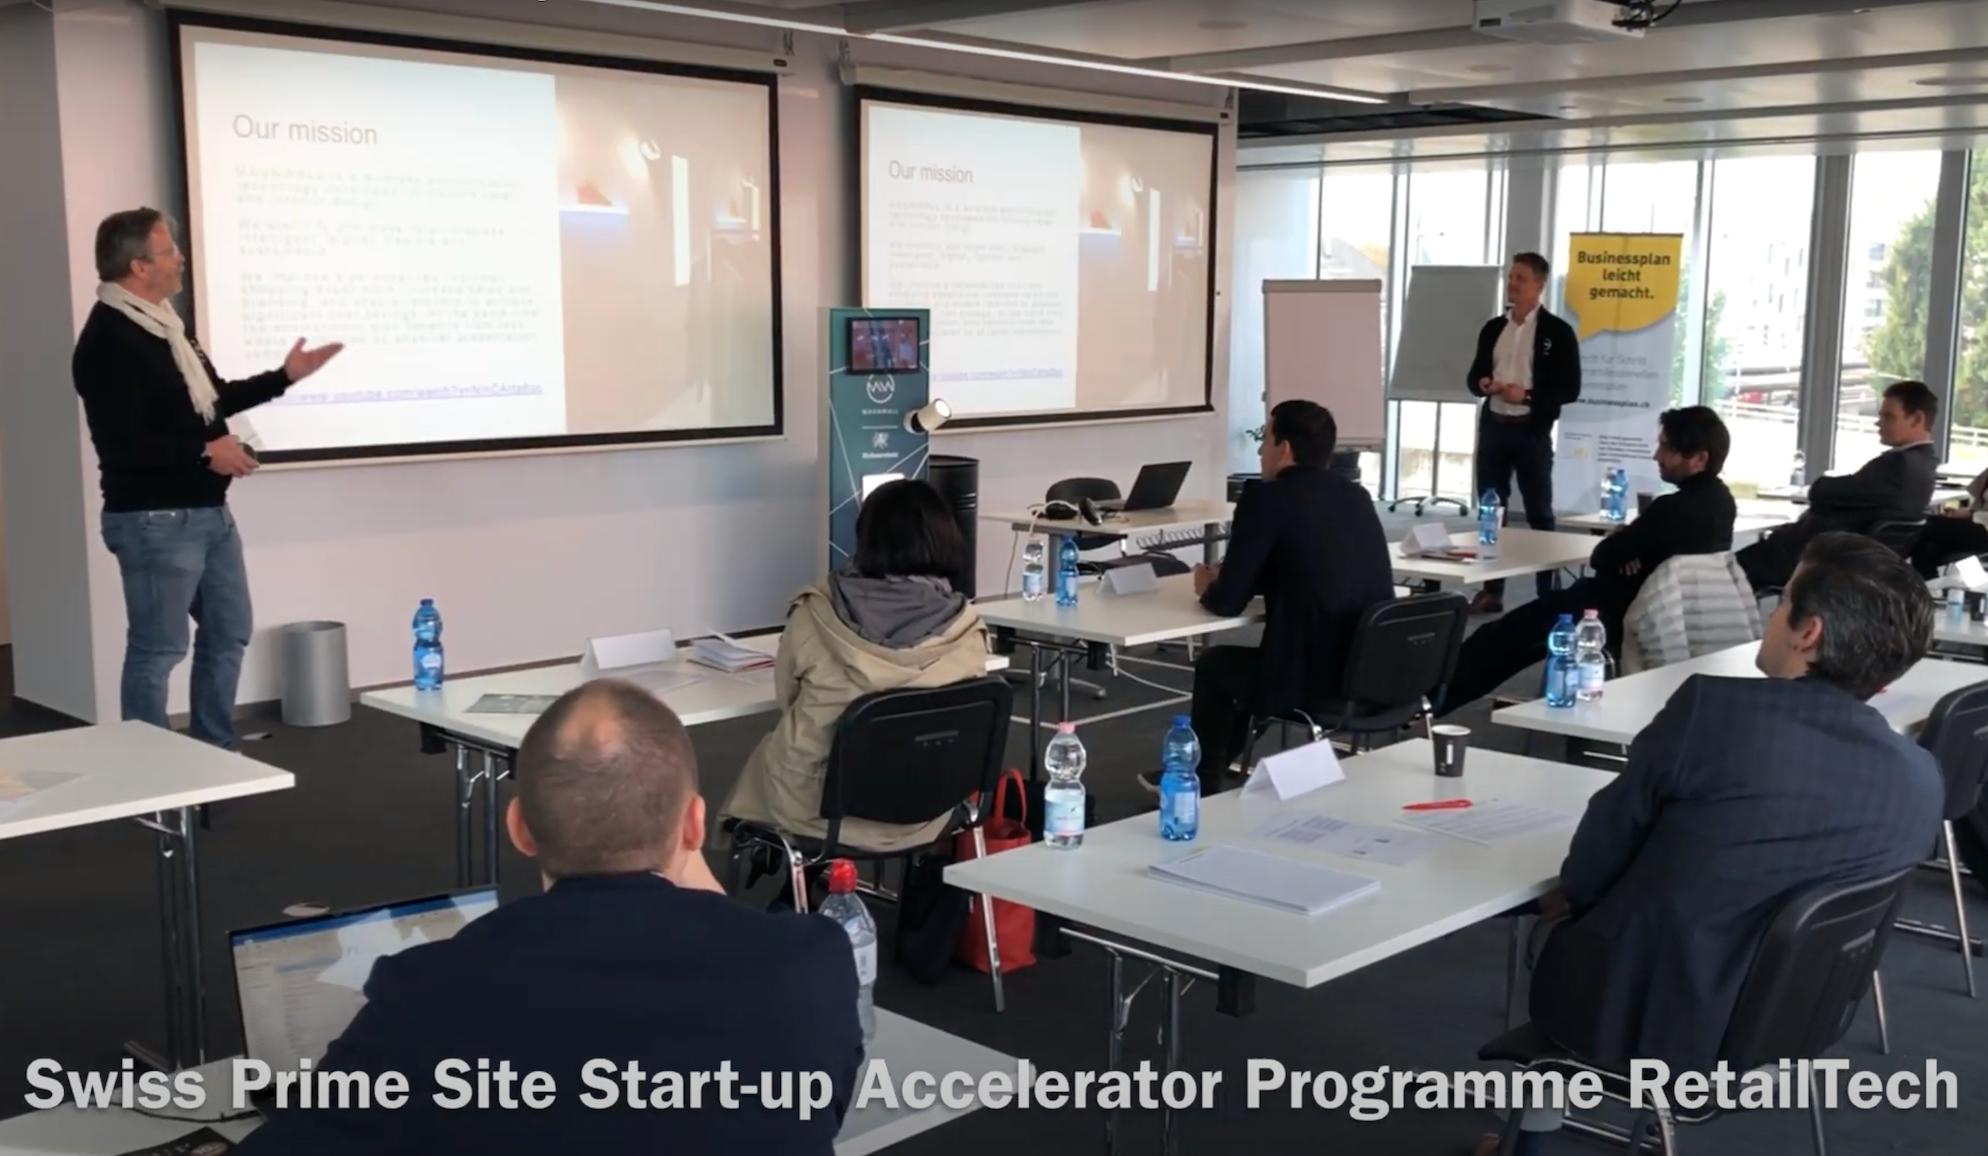 Successful POC development during the Swiss Prime Site Accelerator Programme in RetailTech